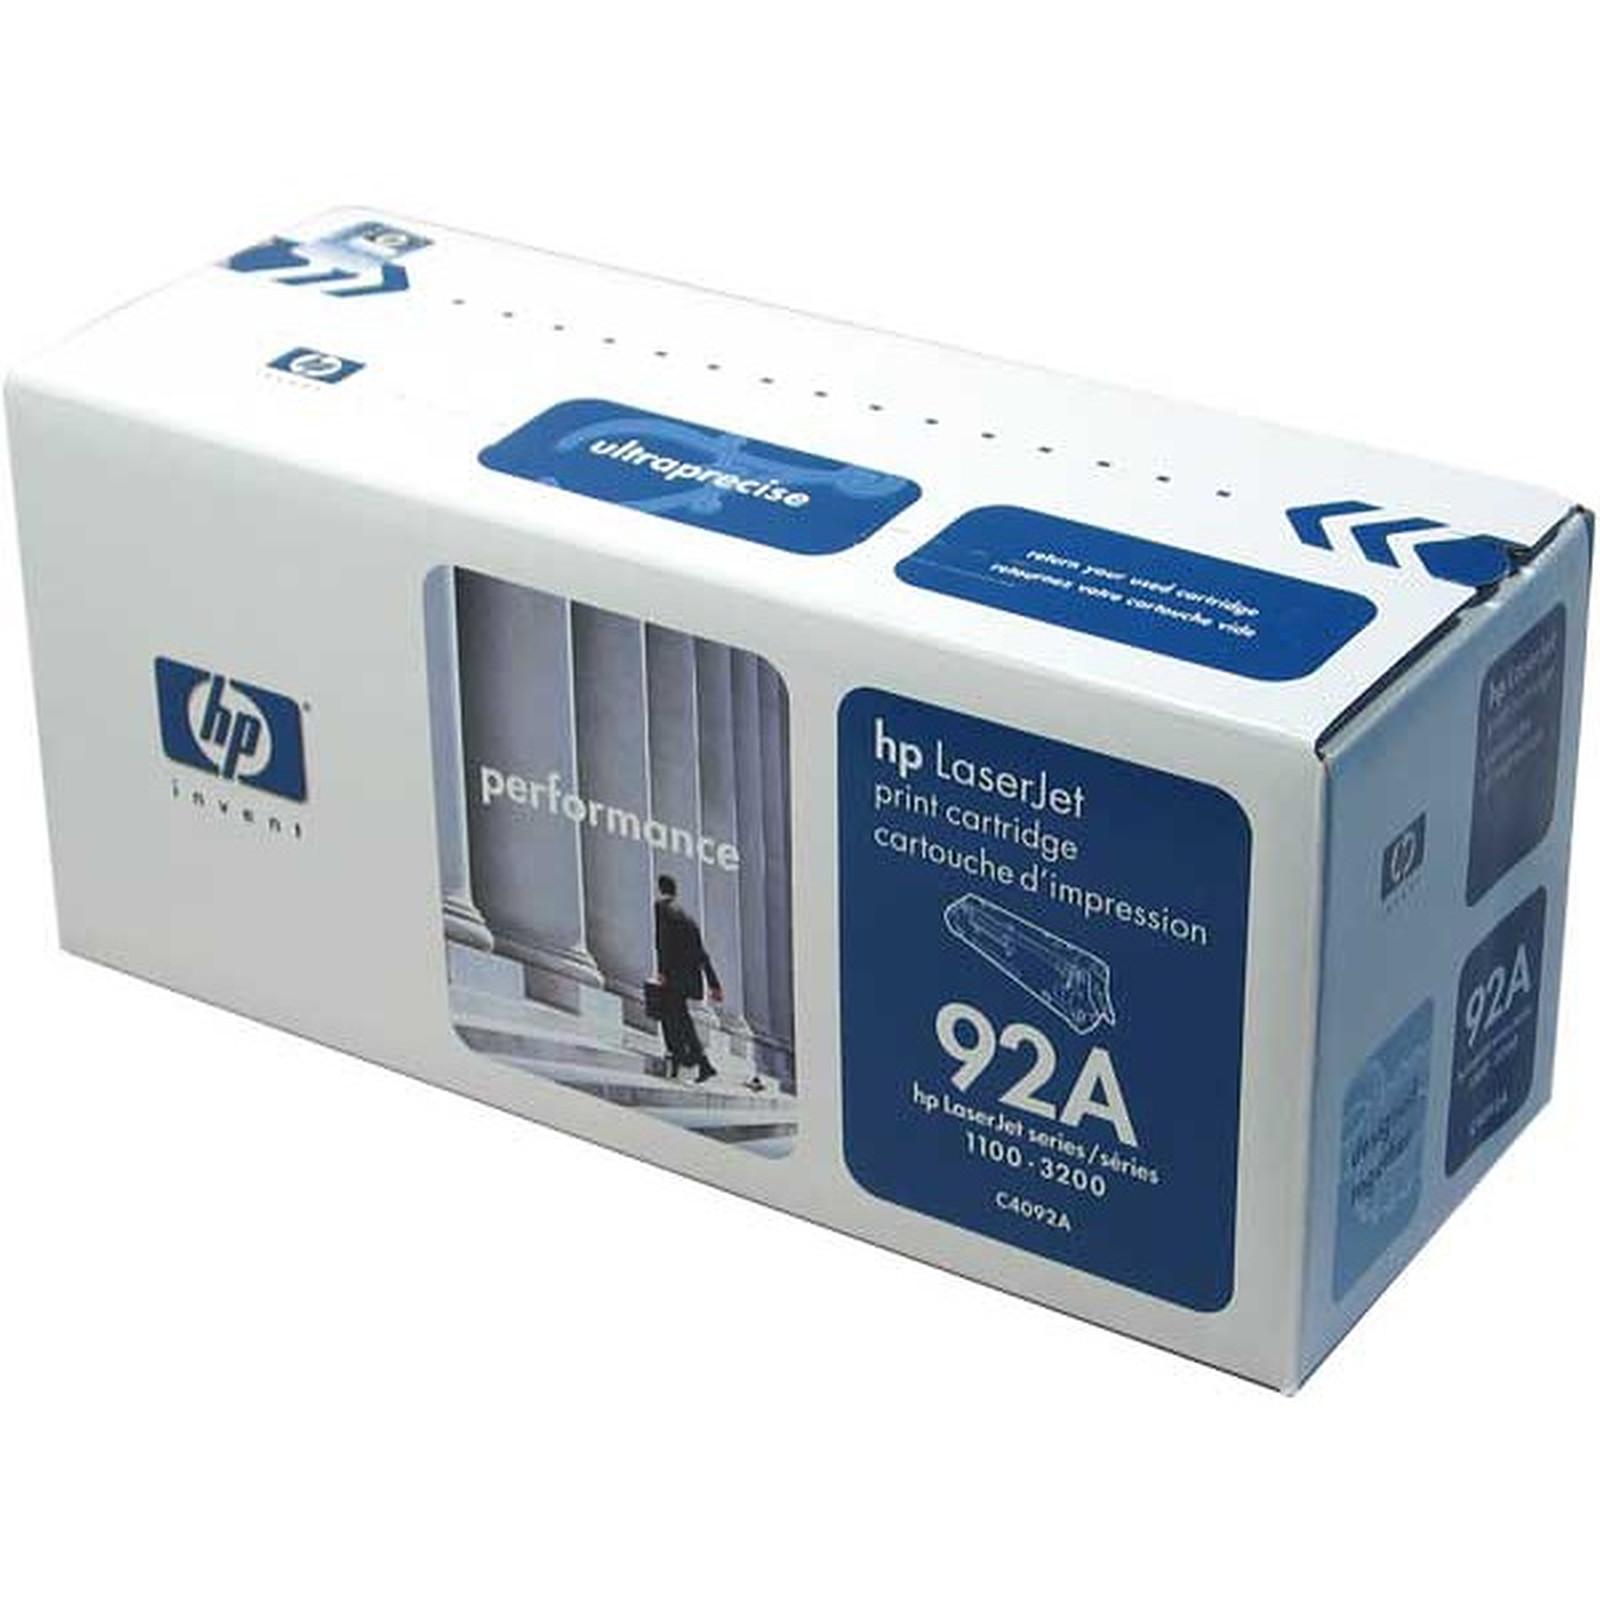 HP 92A (C4092A) - Toner imprimante HP sur LDLC.com